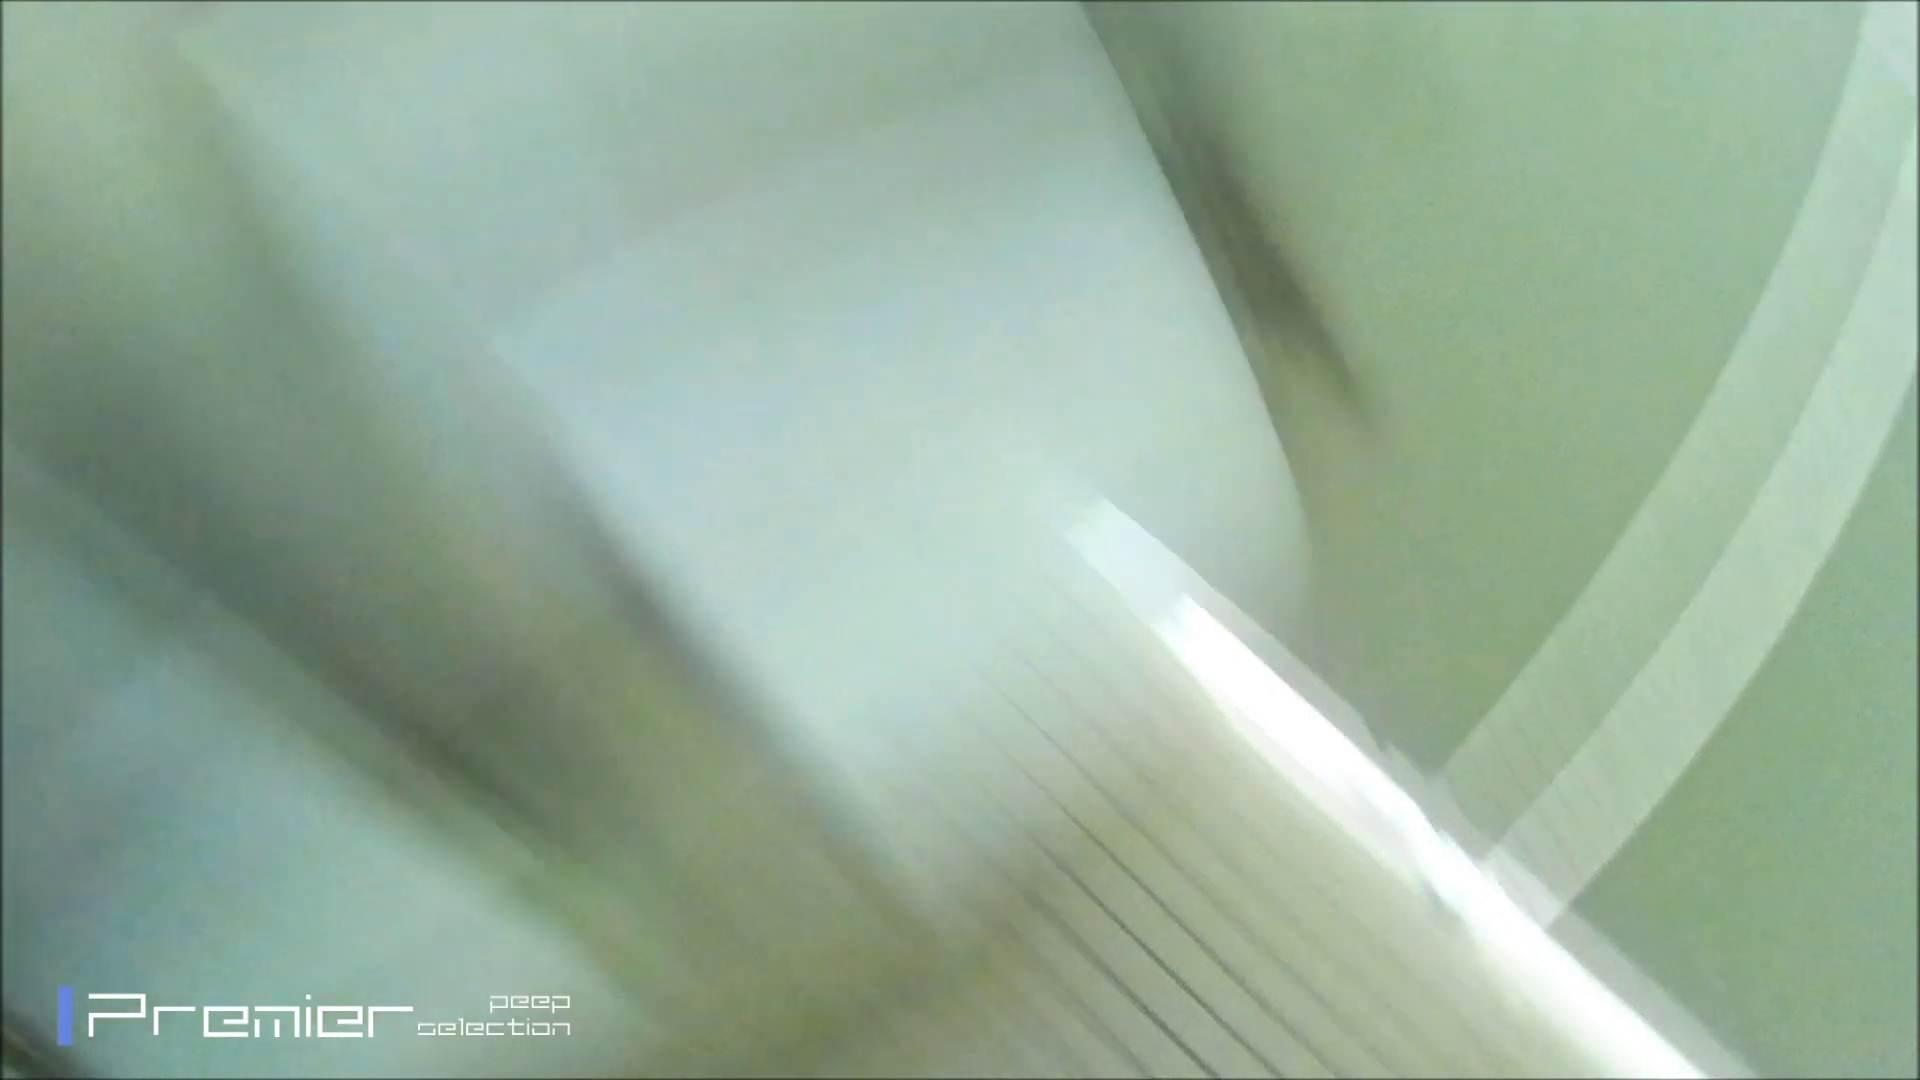 FHD激カワ!激やば! 復讐のトイレ盗撮 Vol.03 高画質動画 エロ画像 28画像 21